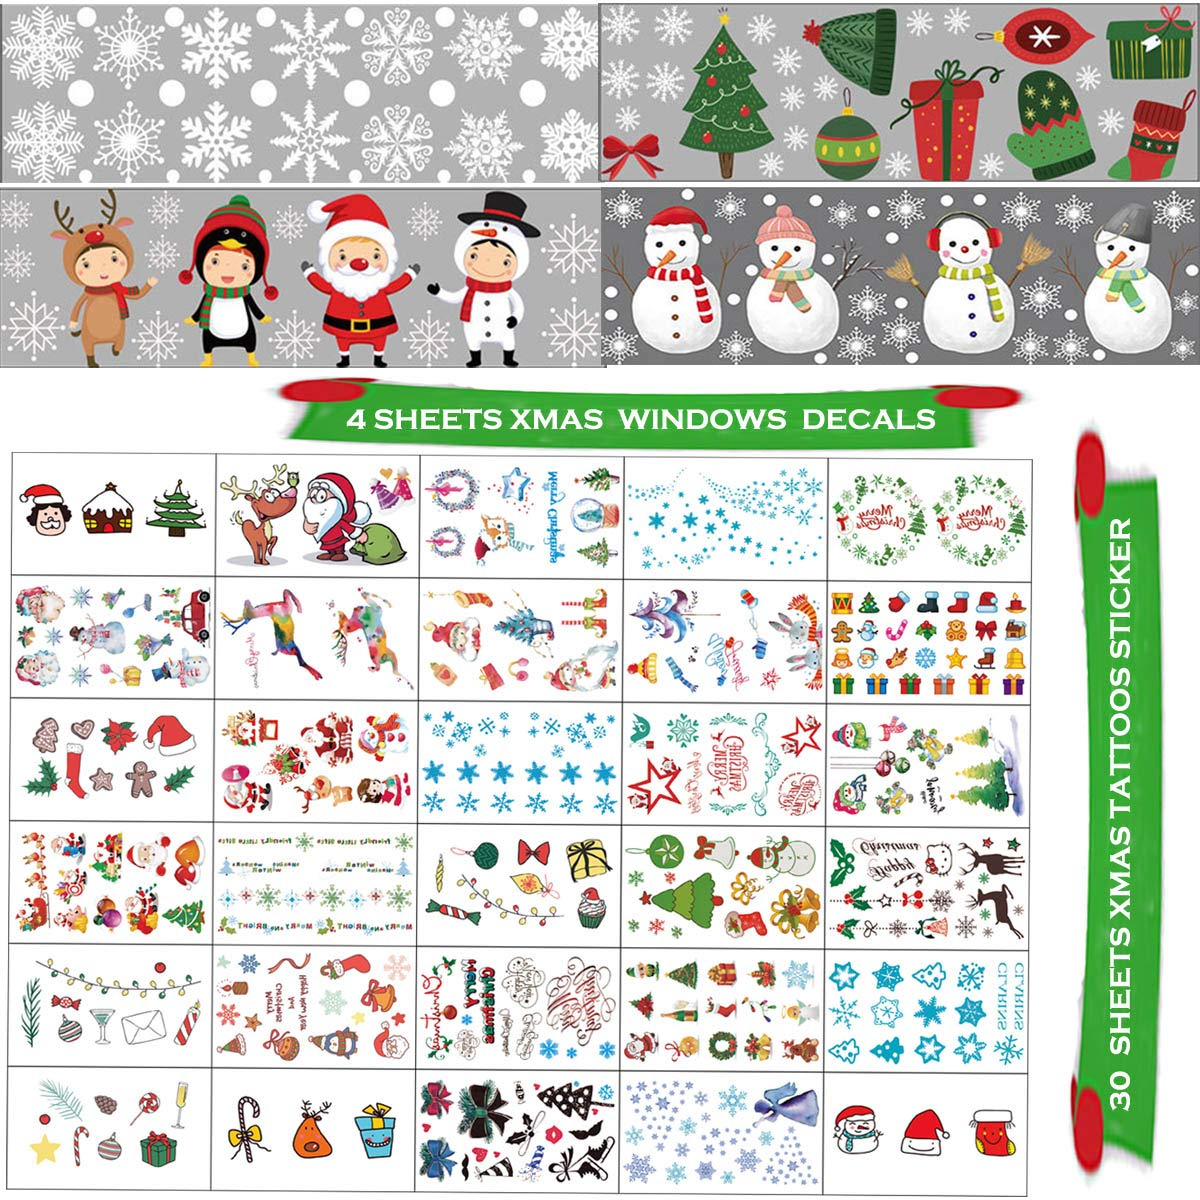 Bonus Tattoos 34 Sheets Youwith Joy 400+ Christmas Window Cling Sticker Snowflake Decoration Winter Wonderland Xmas Party Supplies Santa Claus Elf Reindeer Snowman Decal Ornament